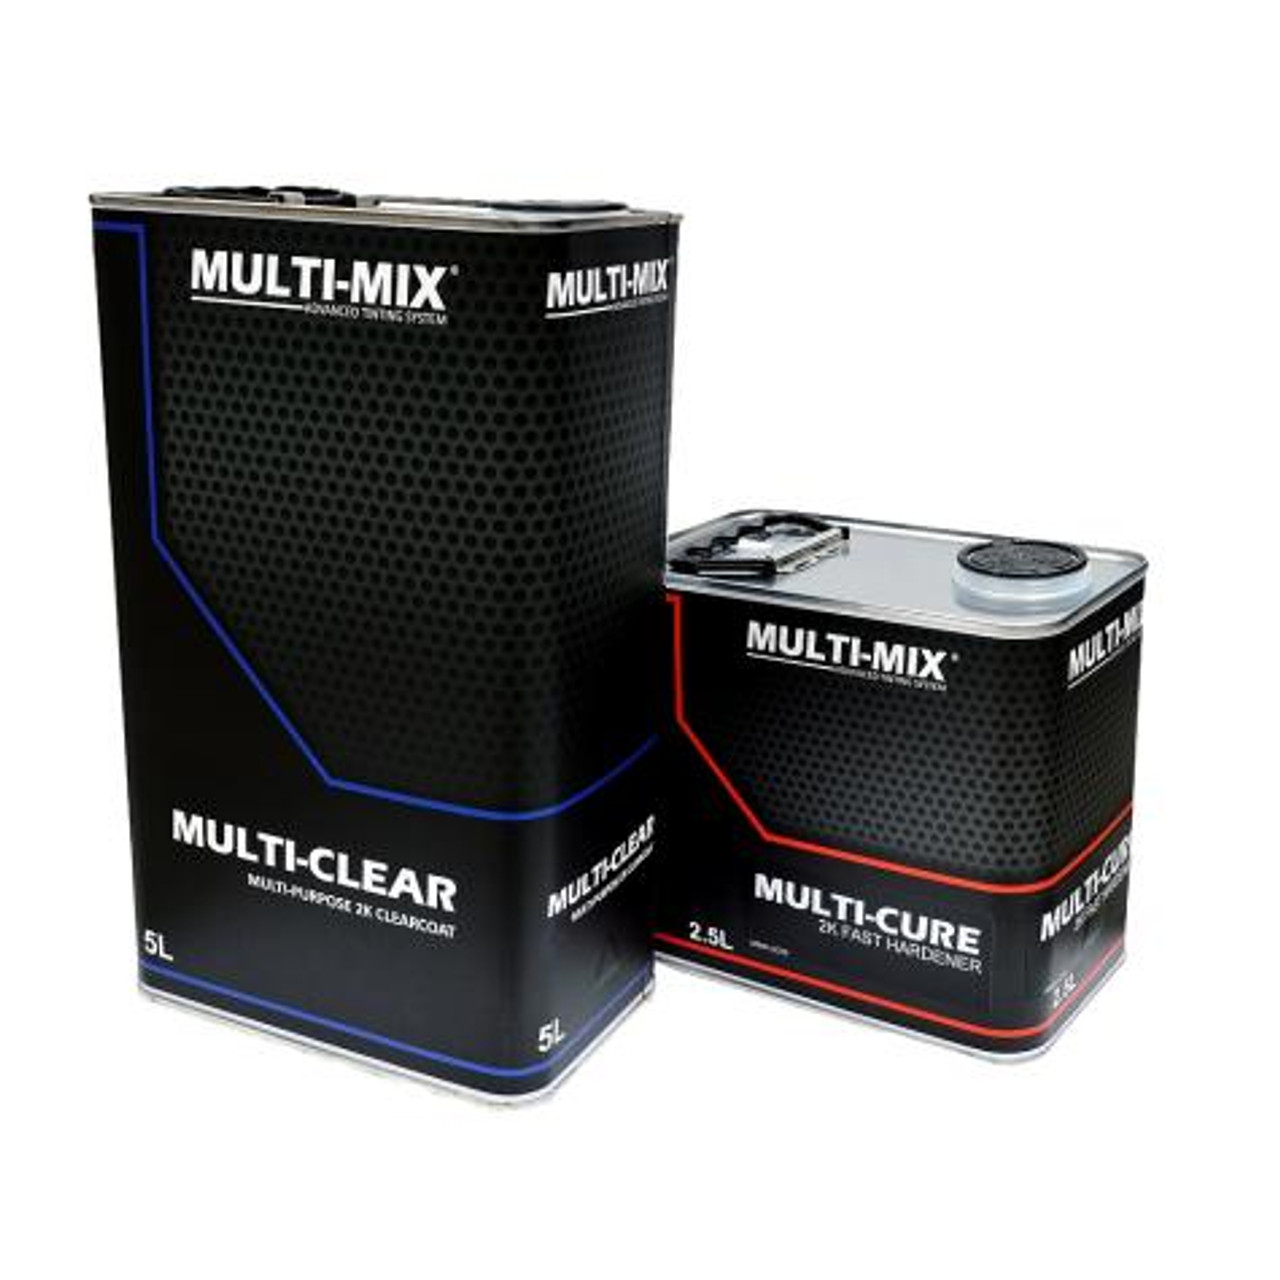 Multi-Mix Multi Clear 2K Clearcoat 7.5L Kit